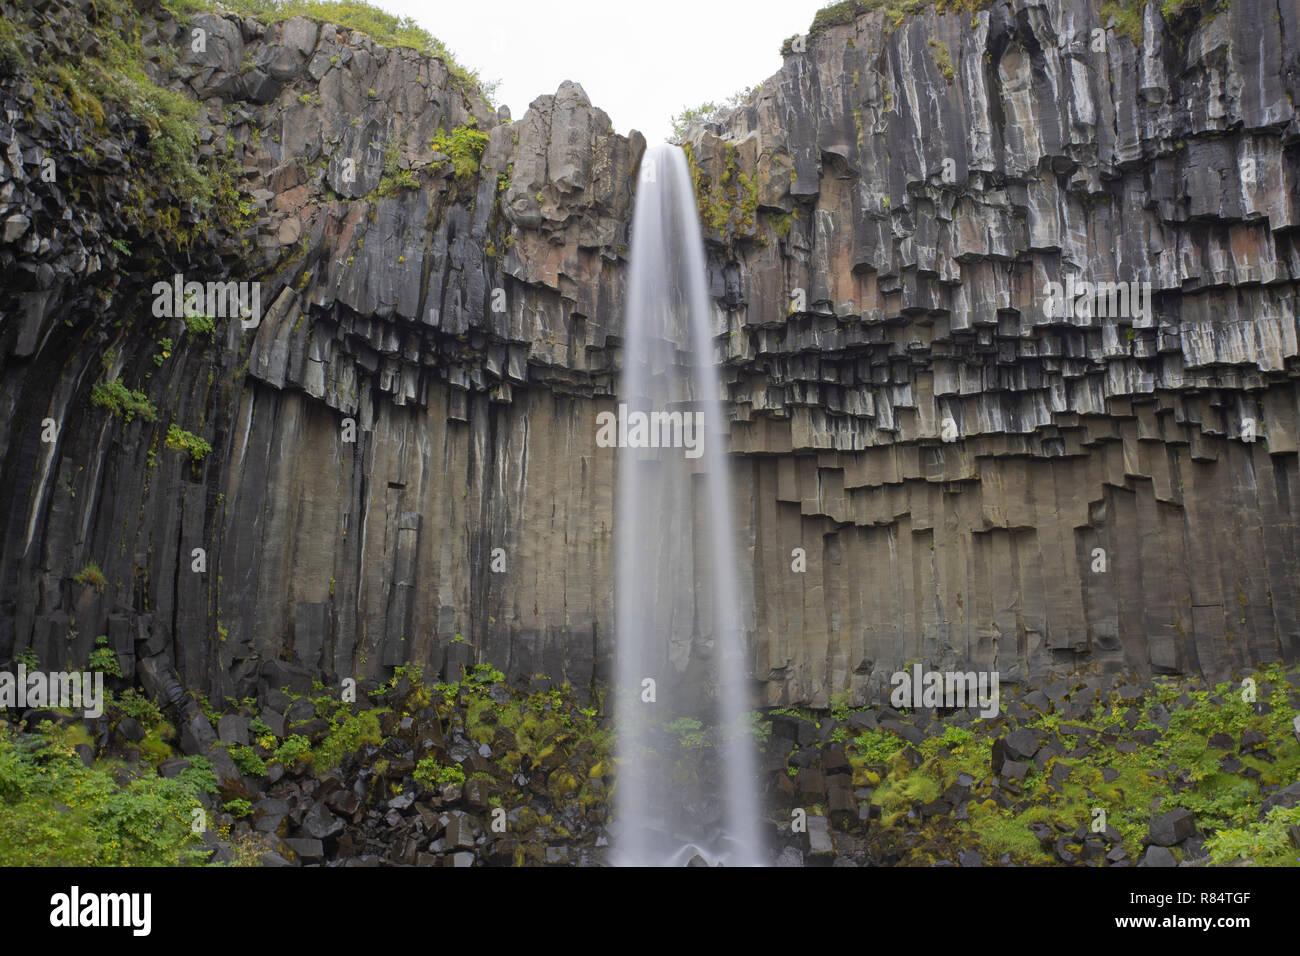 Svartifoss Waterfall and basalt columns, Iceland - Stock Image